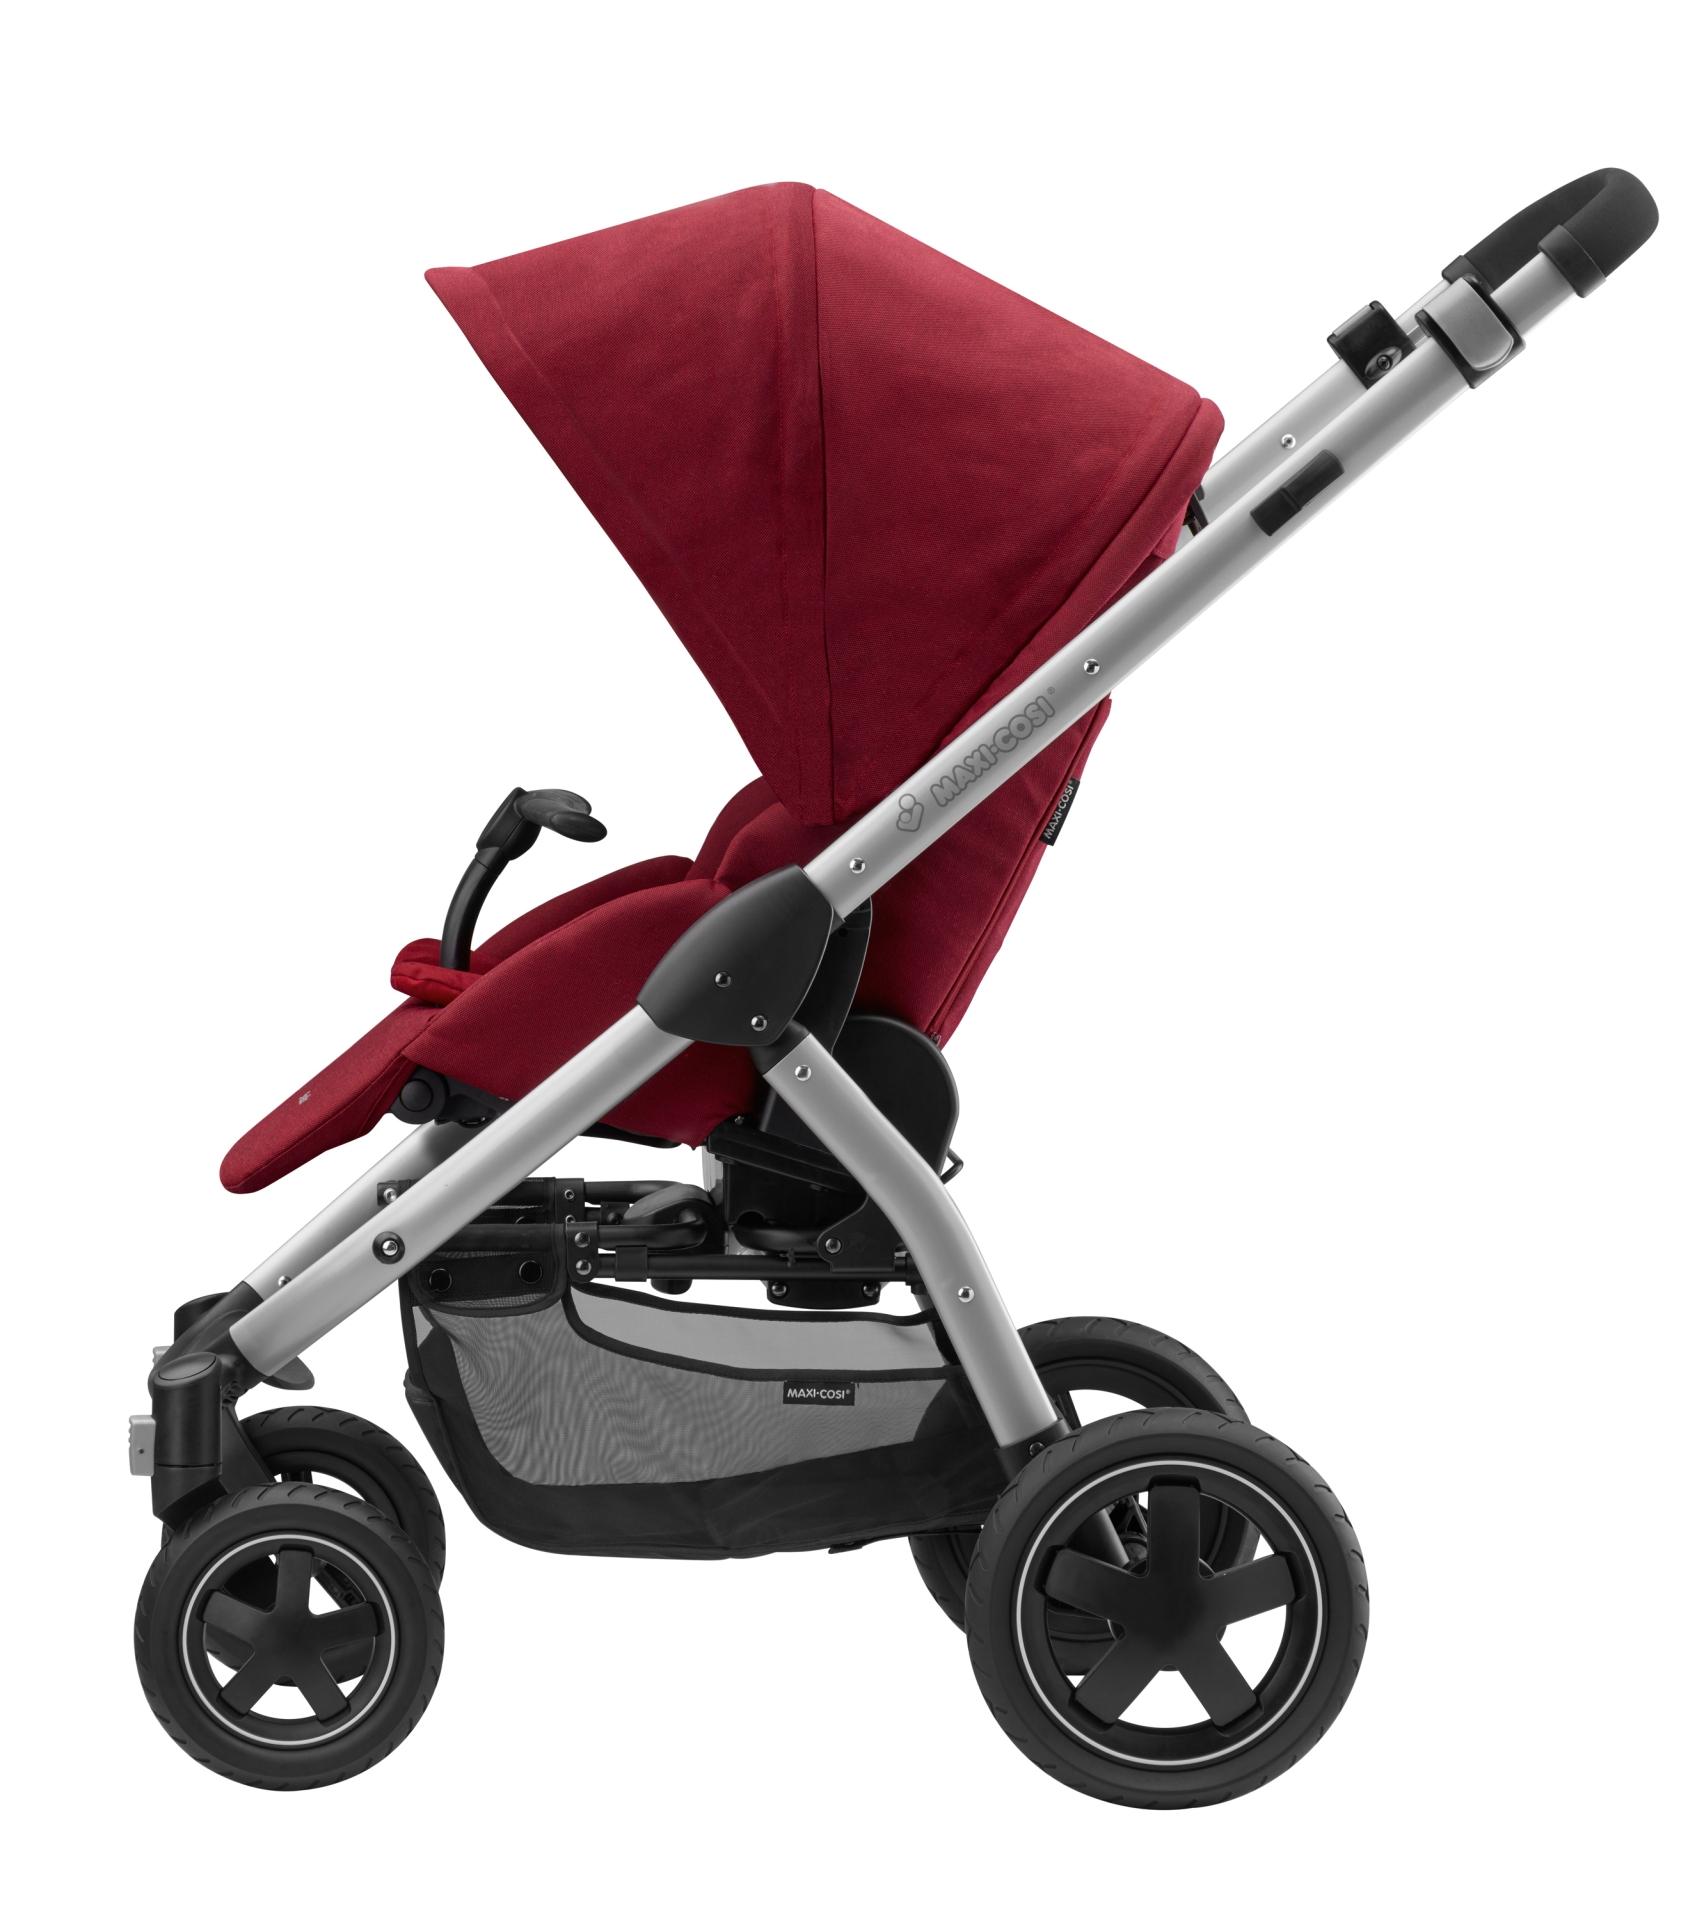 Enticing Stroller Stella Robin Red 2017 Large Image Stroller Stella Maxi Cosi Stroller Cup Her Maxi Cosi Stroller baby Maxi Cosi Stroller